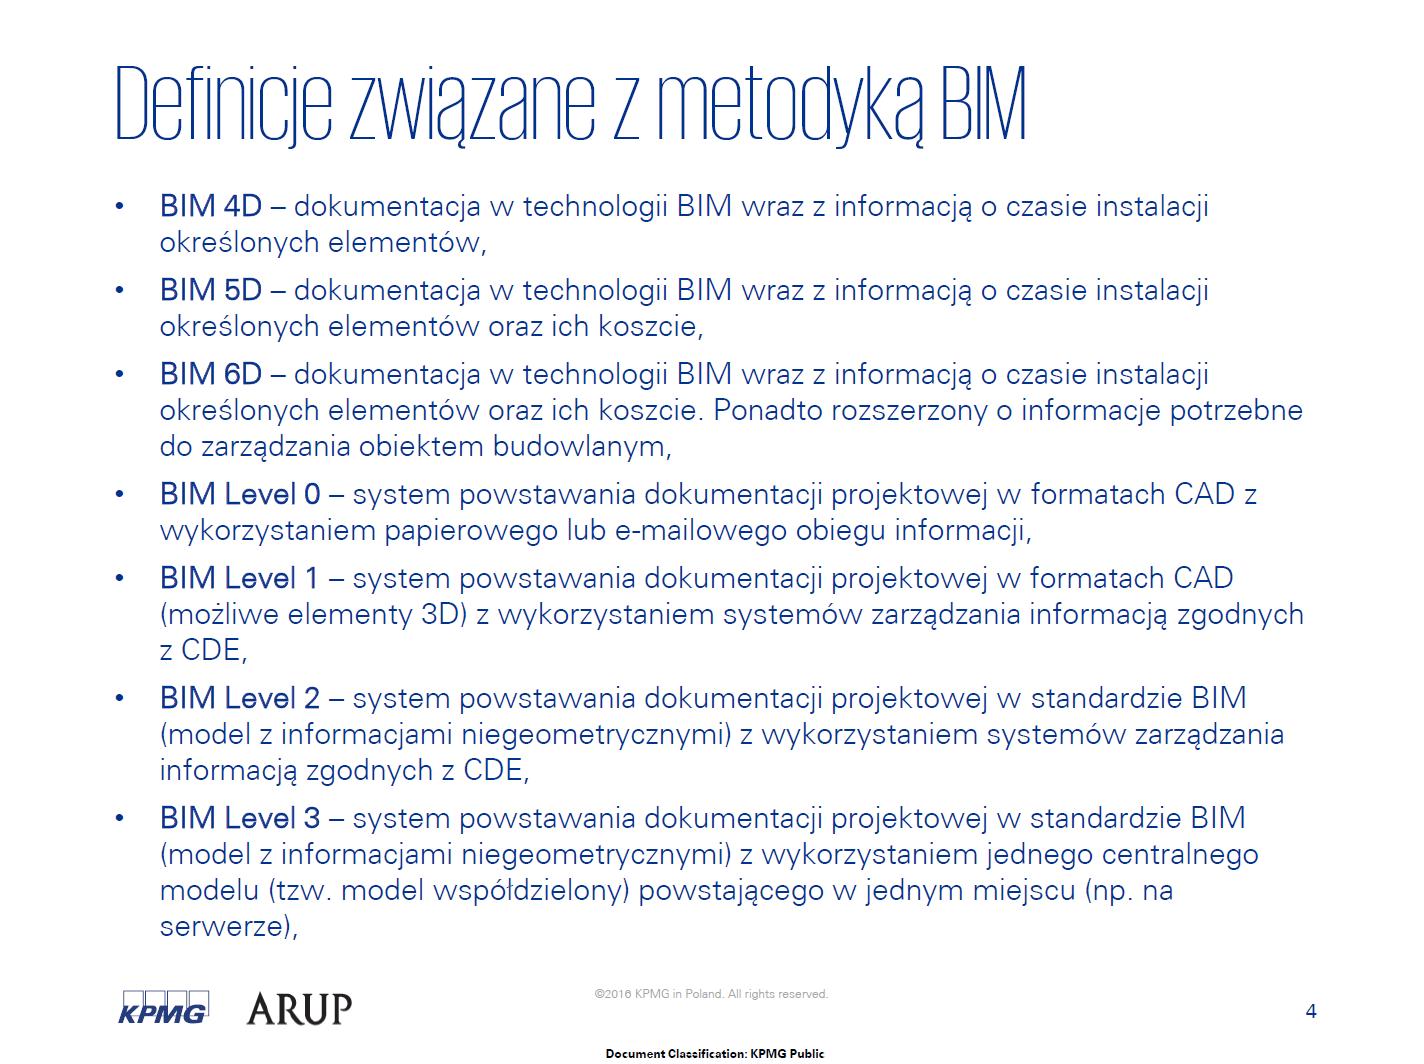 bim-level-0